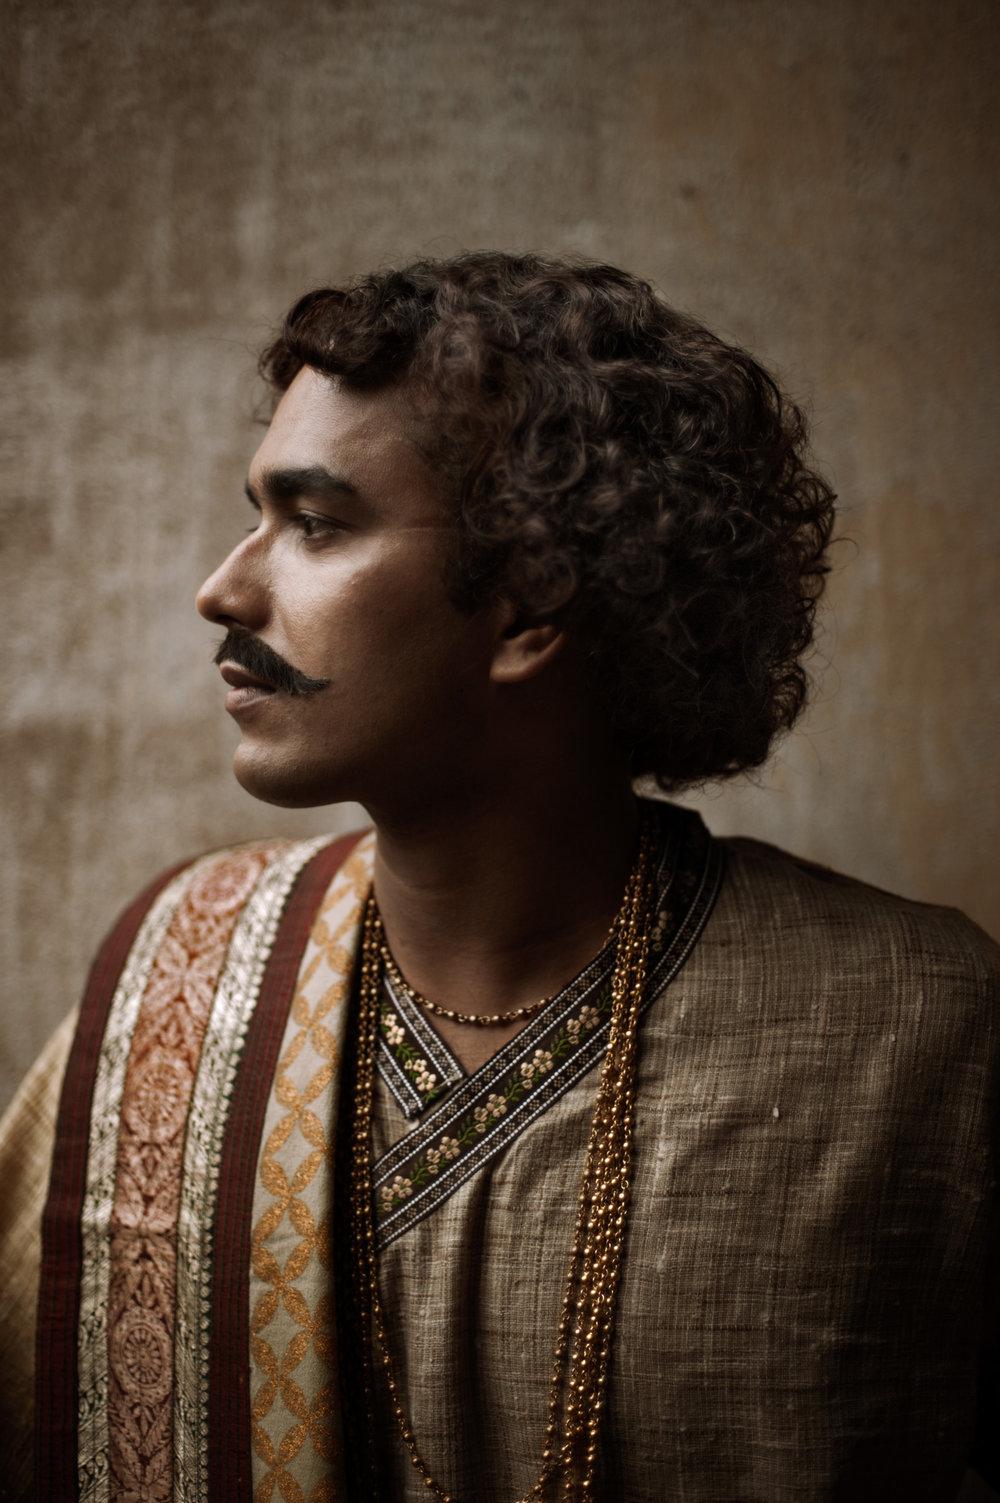 4_Chhandak Pradhan-fashion-Ruins and a Requiem-vintage_feudal_Indian_royal_portrait.jpg